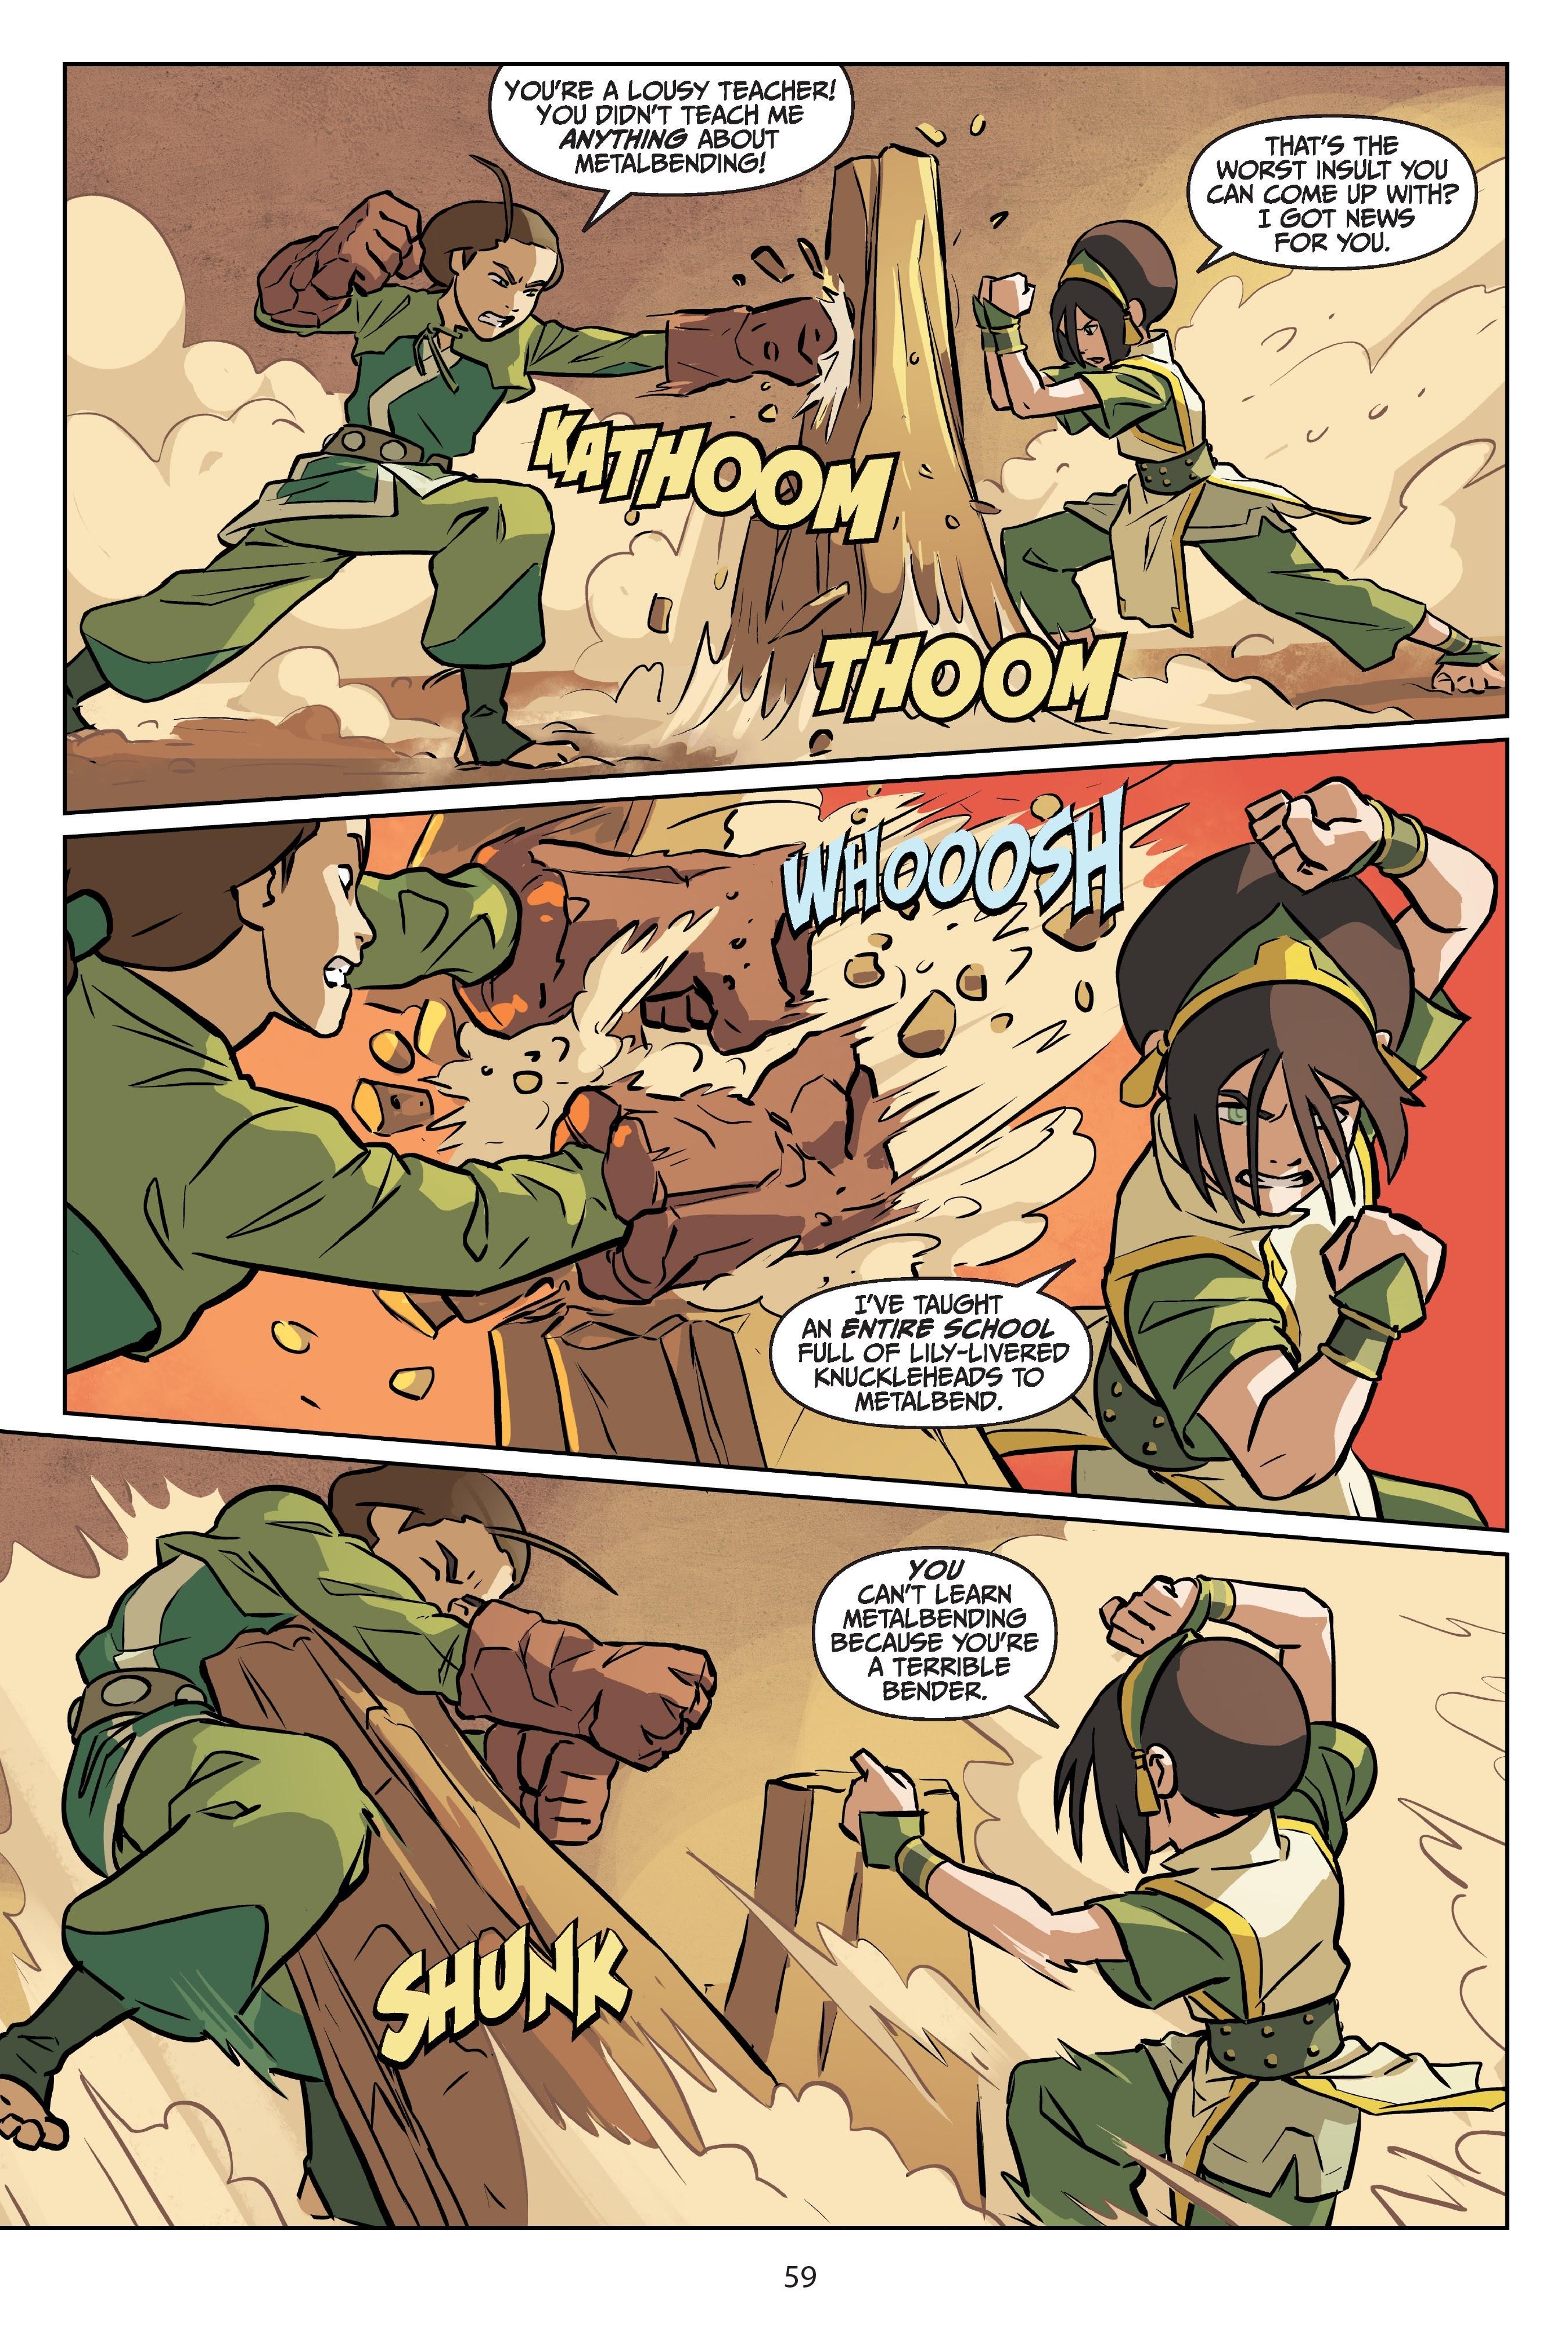 Nickelodeon Avatar: The Last Airbender - Imbalance TPB_2 Page 59